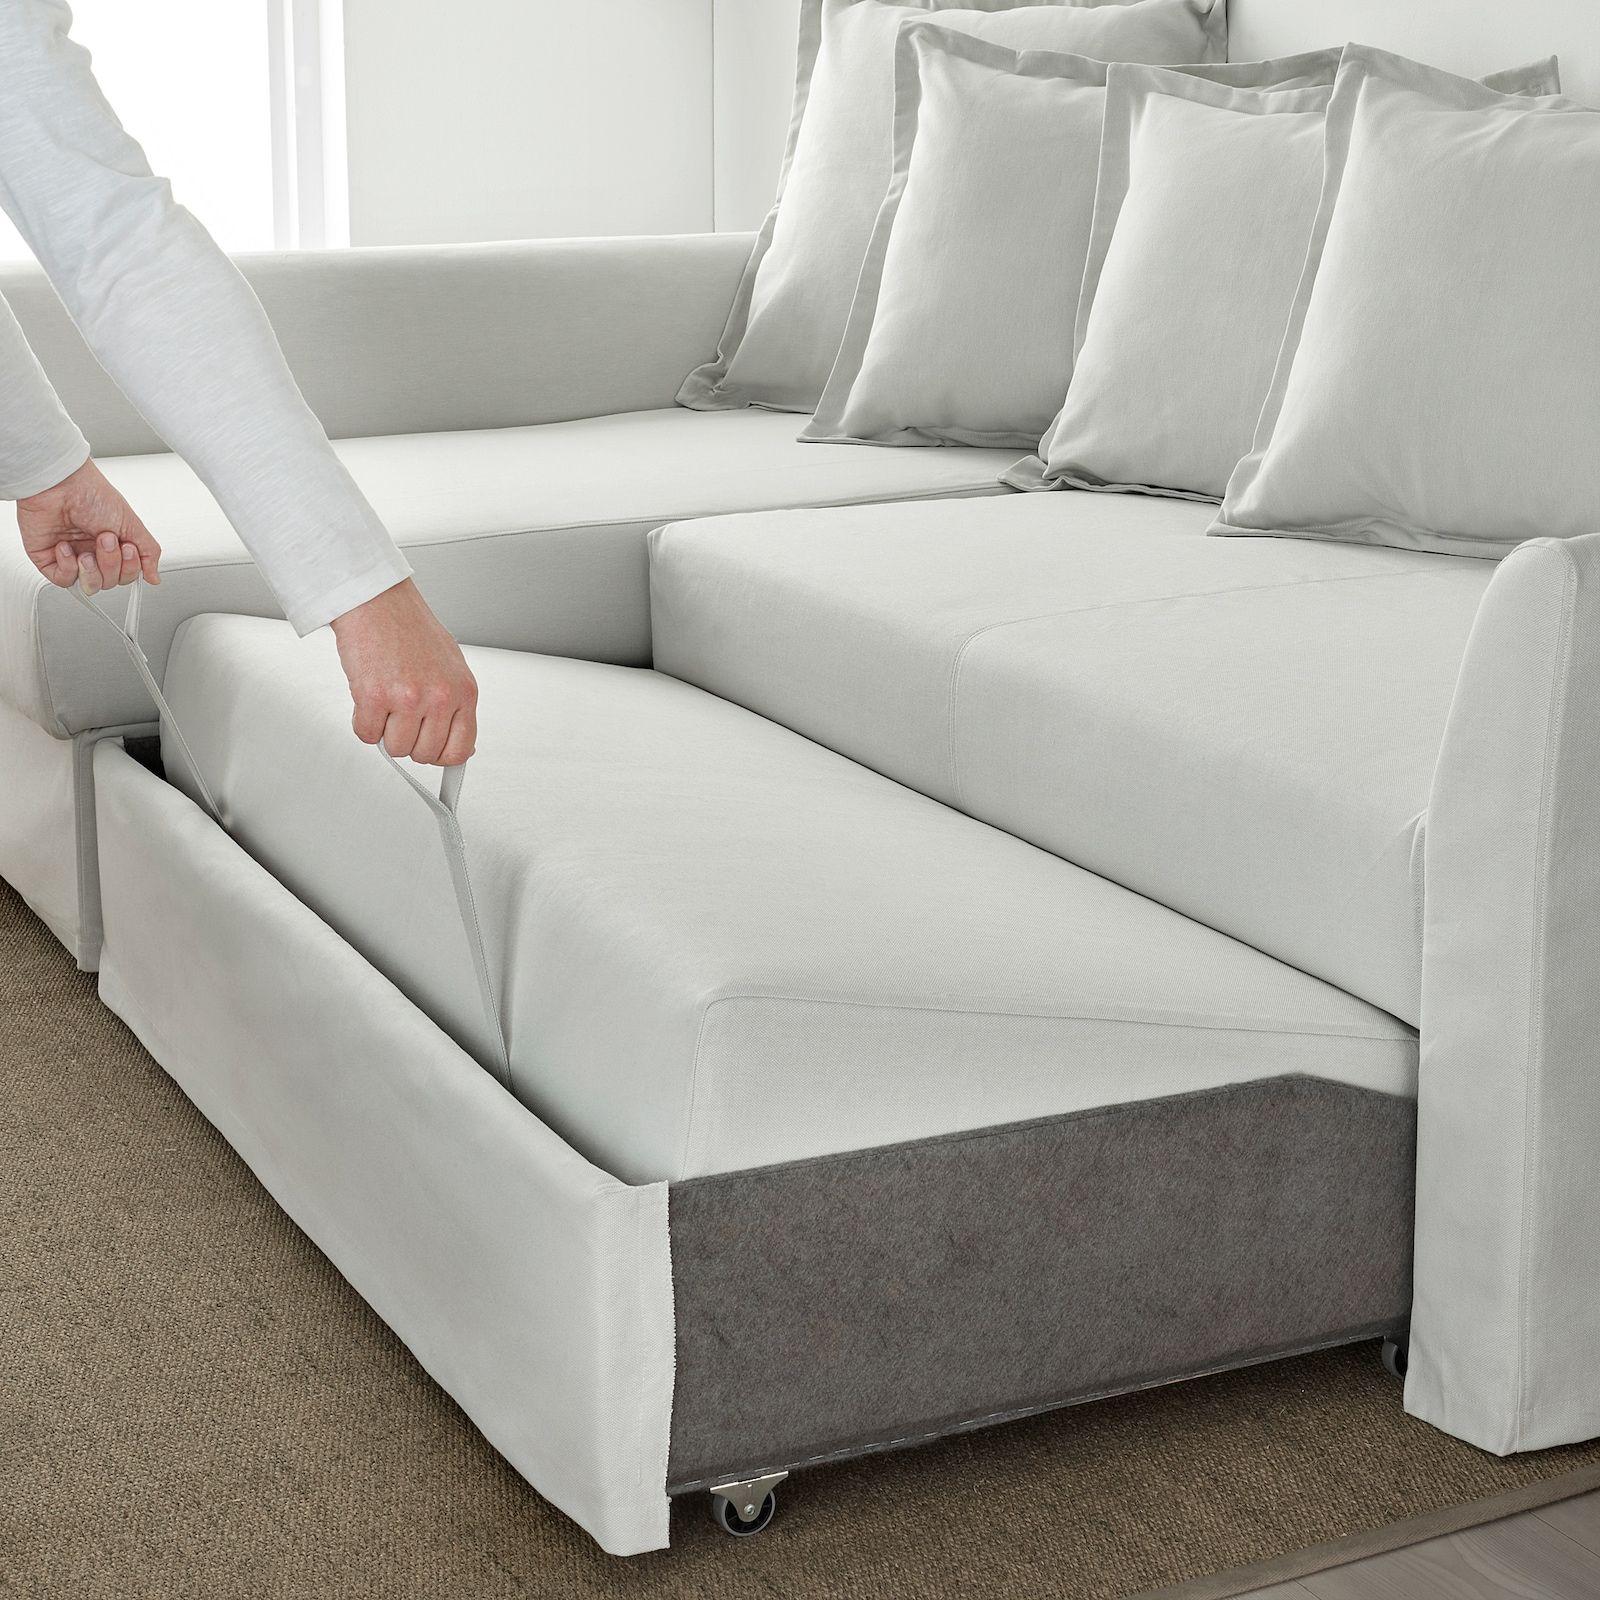 Holmsund Sleeper Sectional 3 Seat Orrsta Light White Gray Ikea In 2020 White Sectional Sofa Sectional Sleeper Sofa Sleeper Sofa Ikea